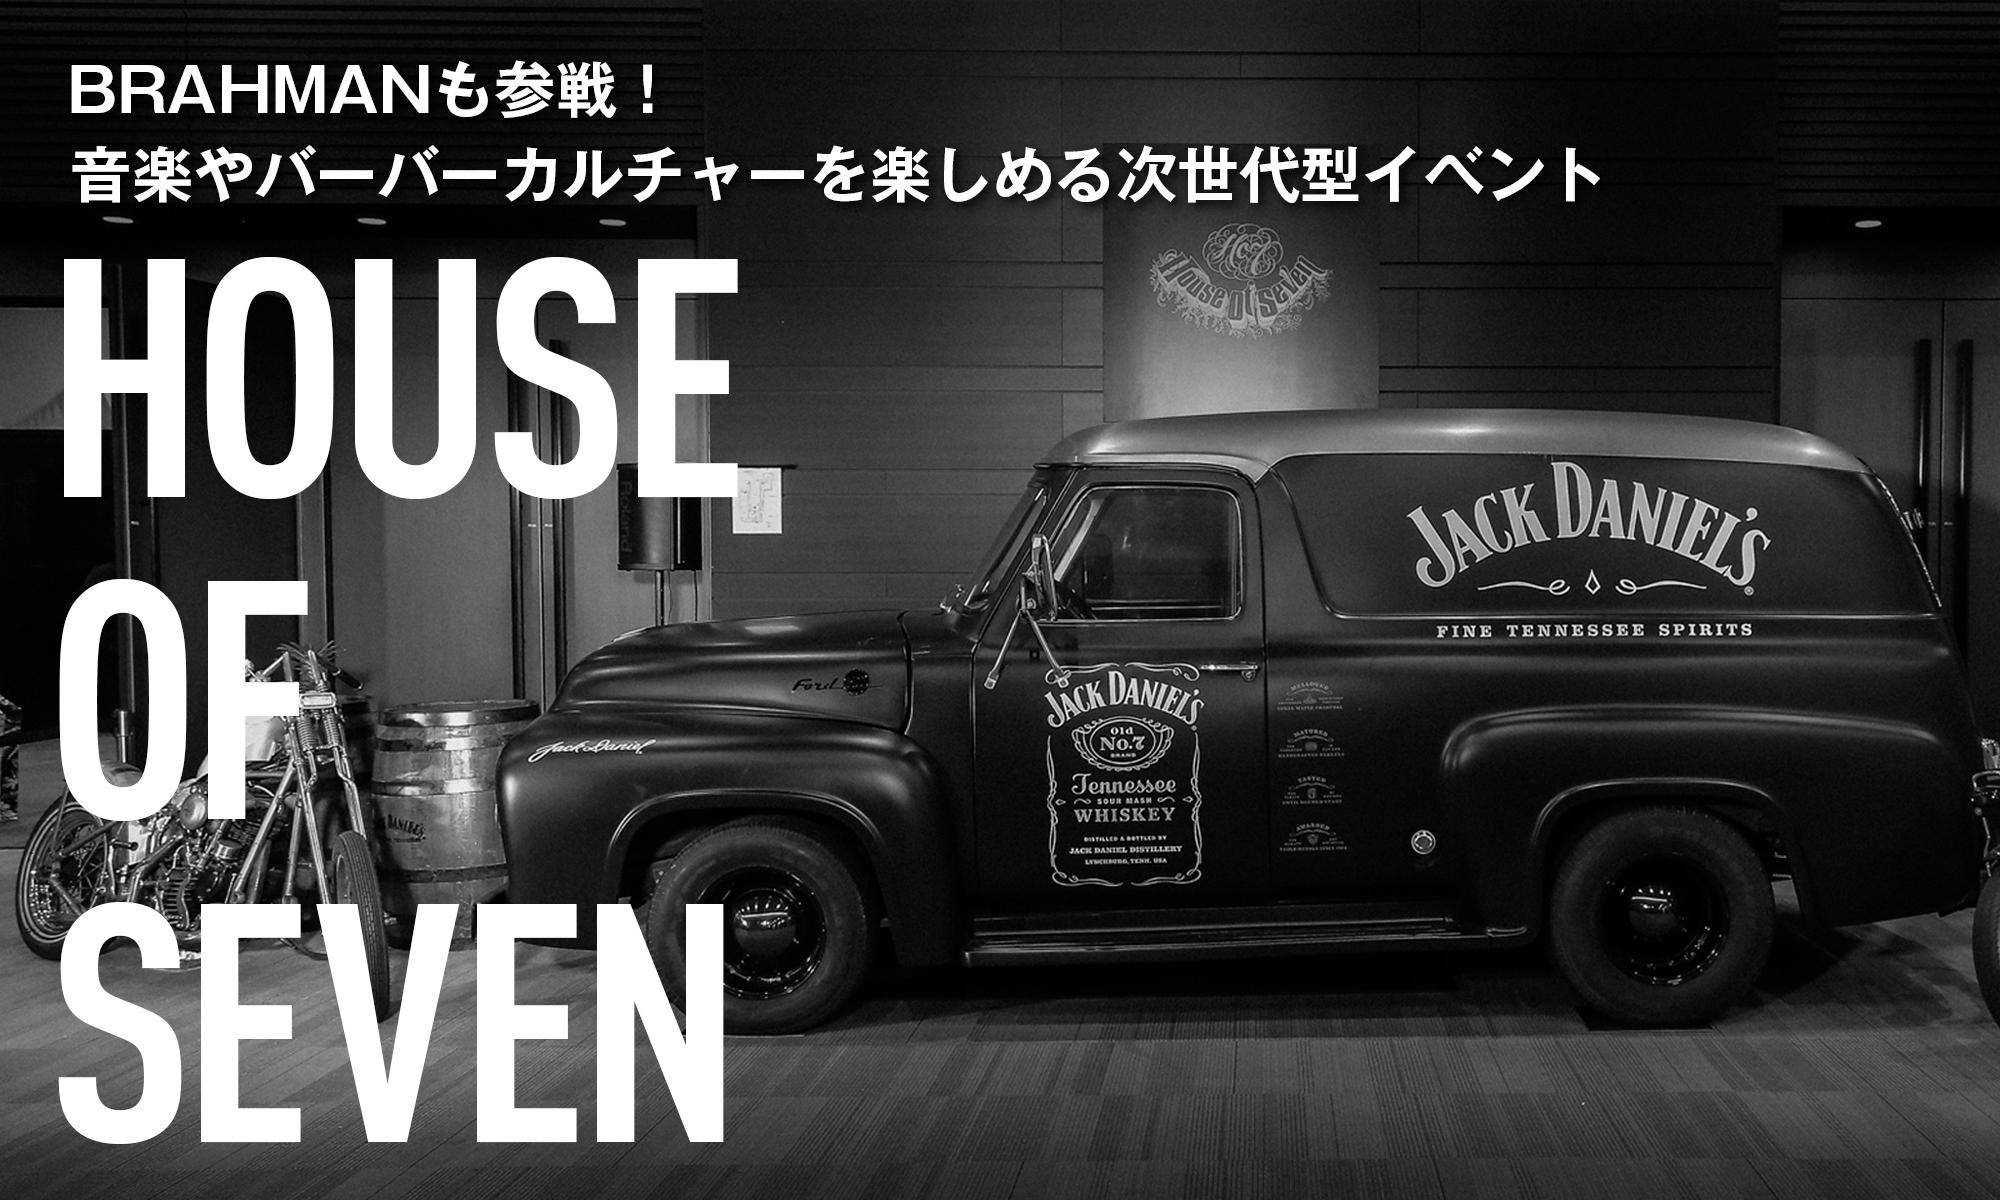 BRAHMANも参戦! 音楽やバーバーカルチャーを楽しめる次世代型イベント「HOUSE OF SEVEN」開催!